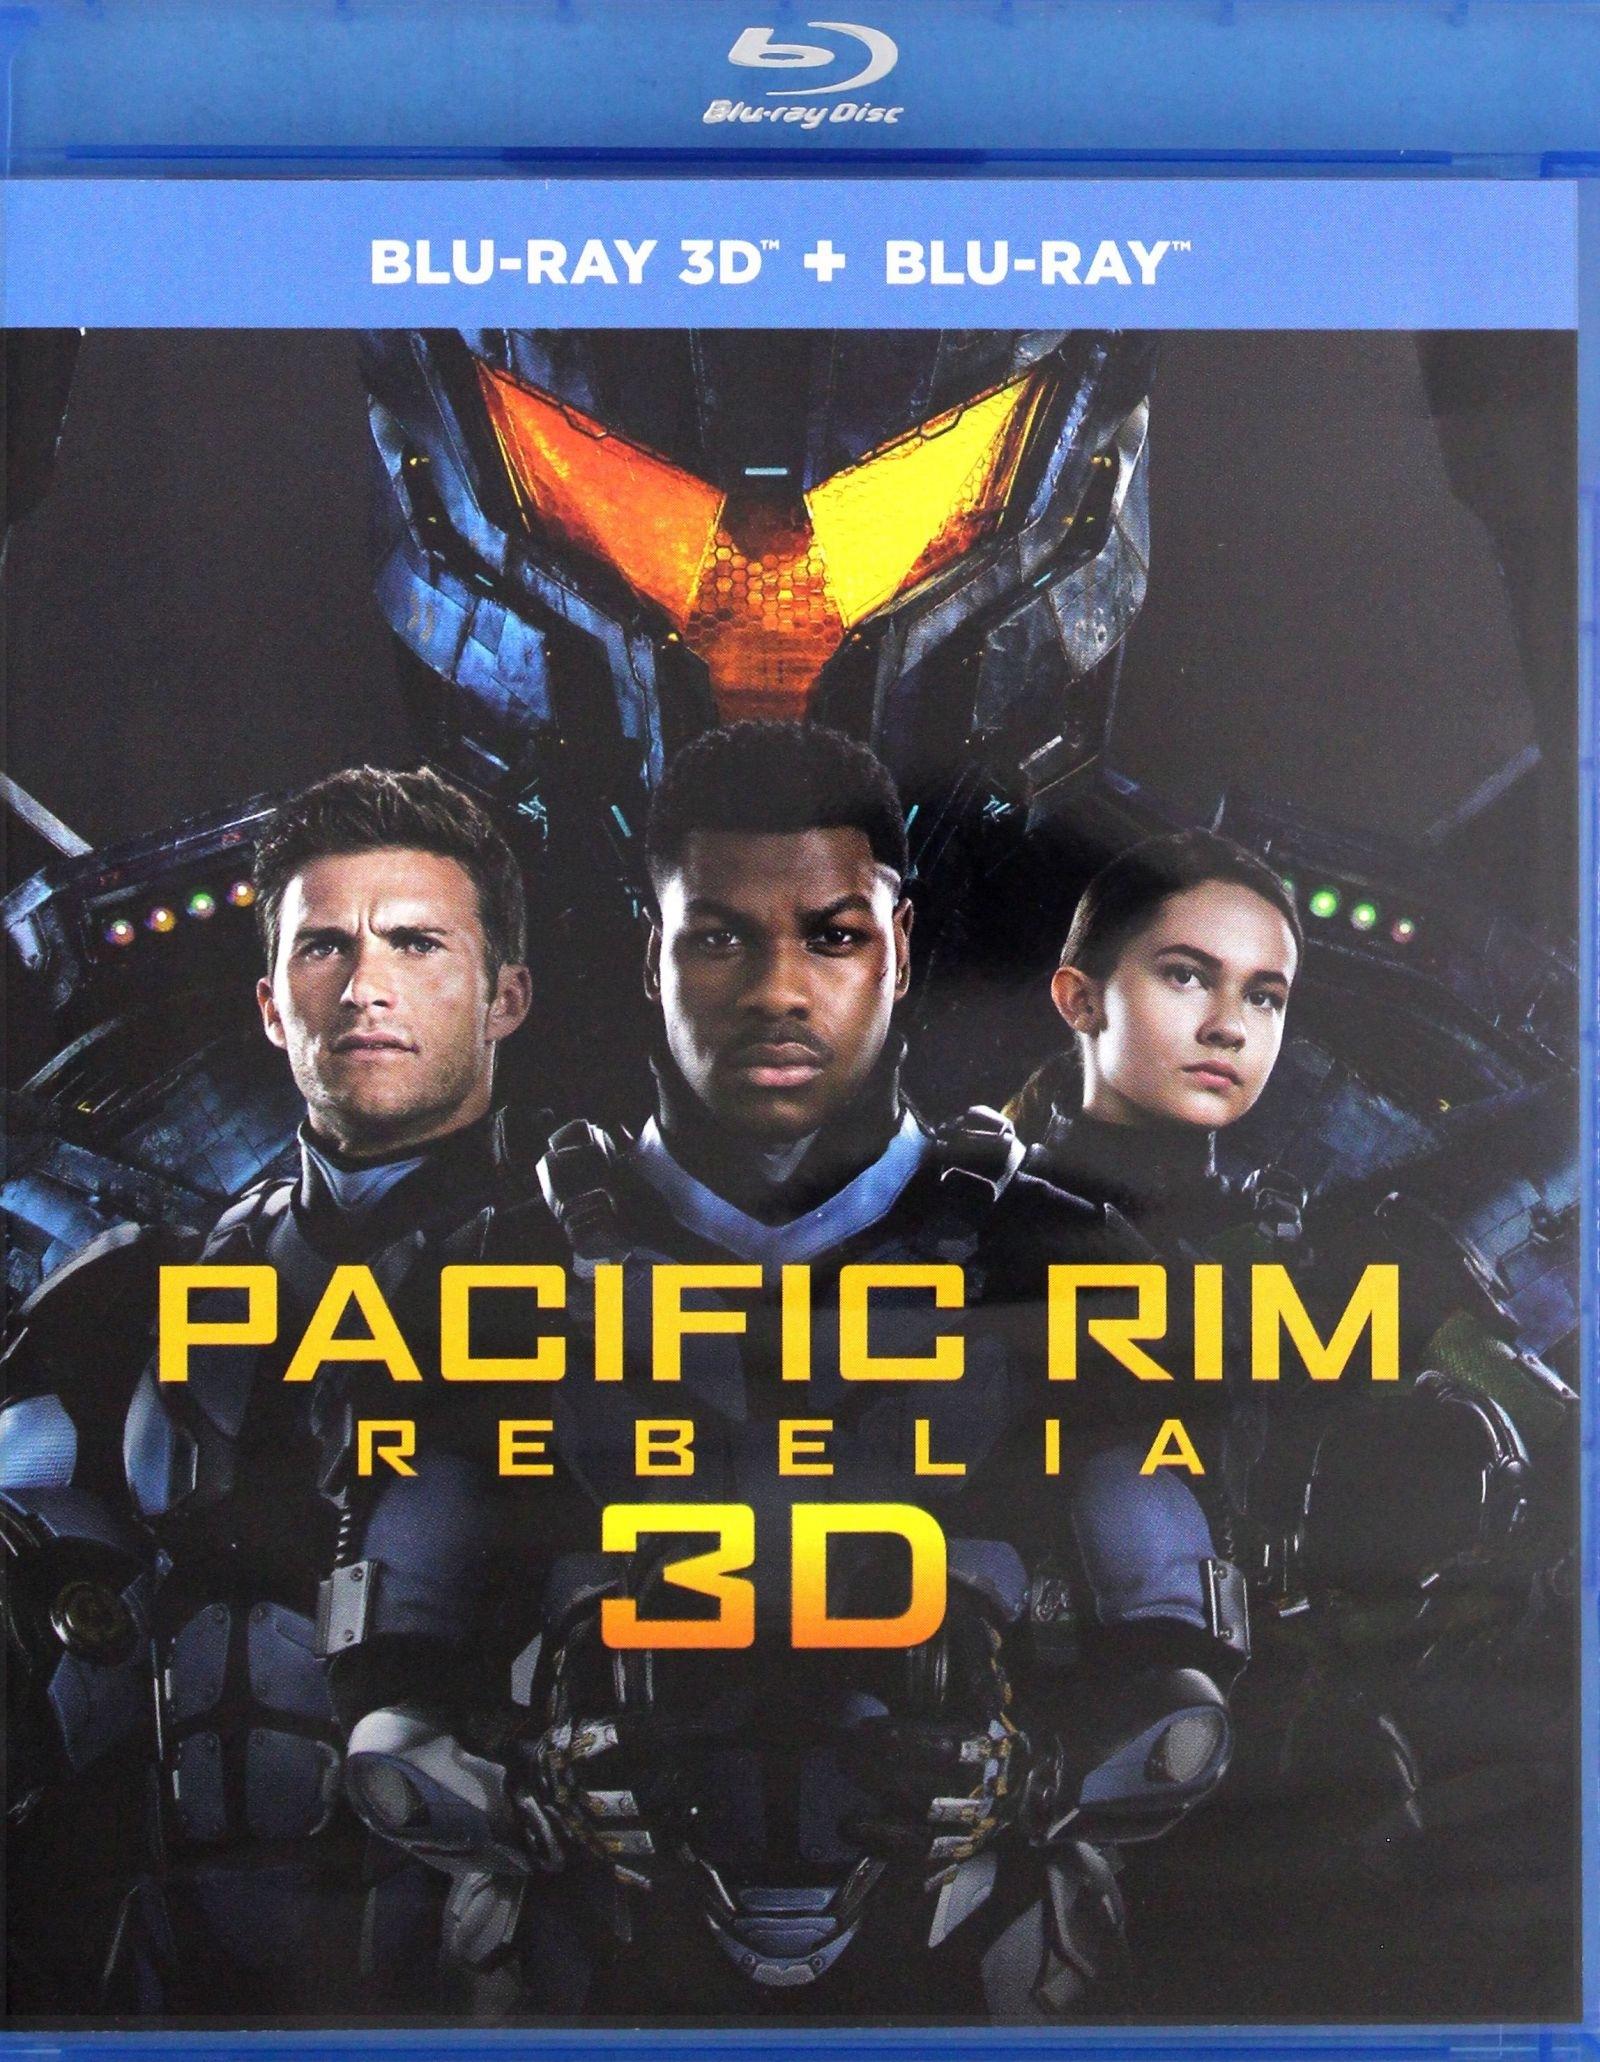 PACIFIC RIM REBELIA BLU-RAY 3D + BLU-RAY PL